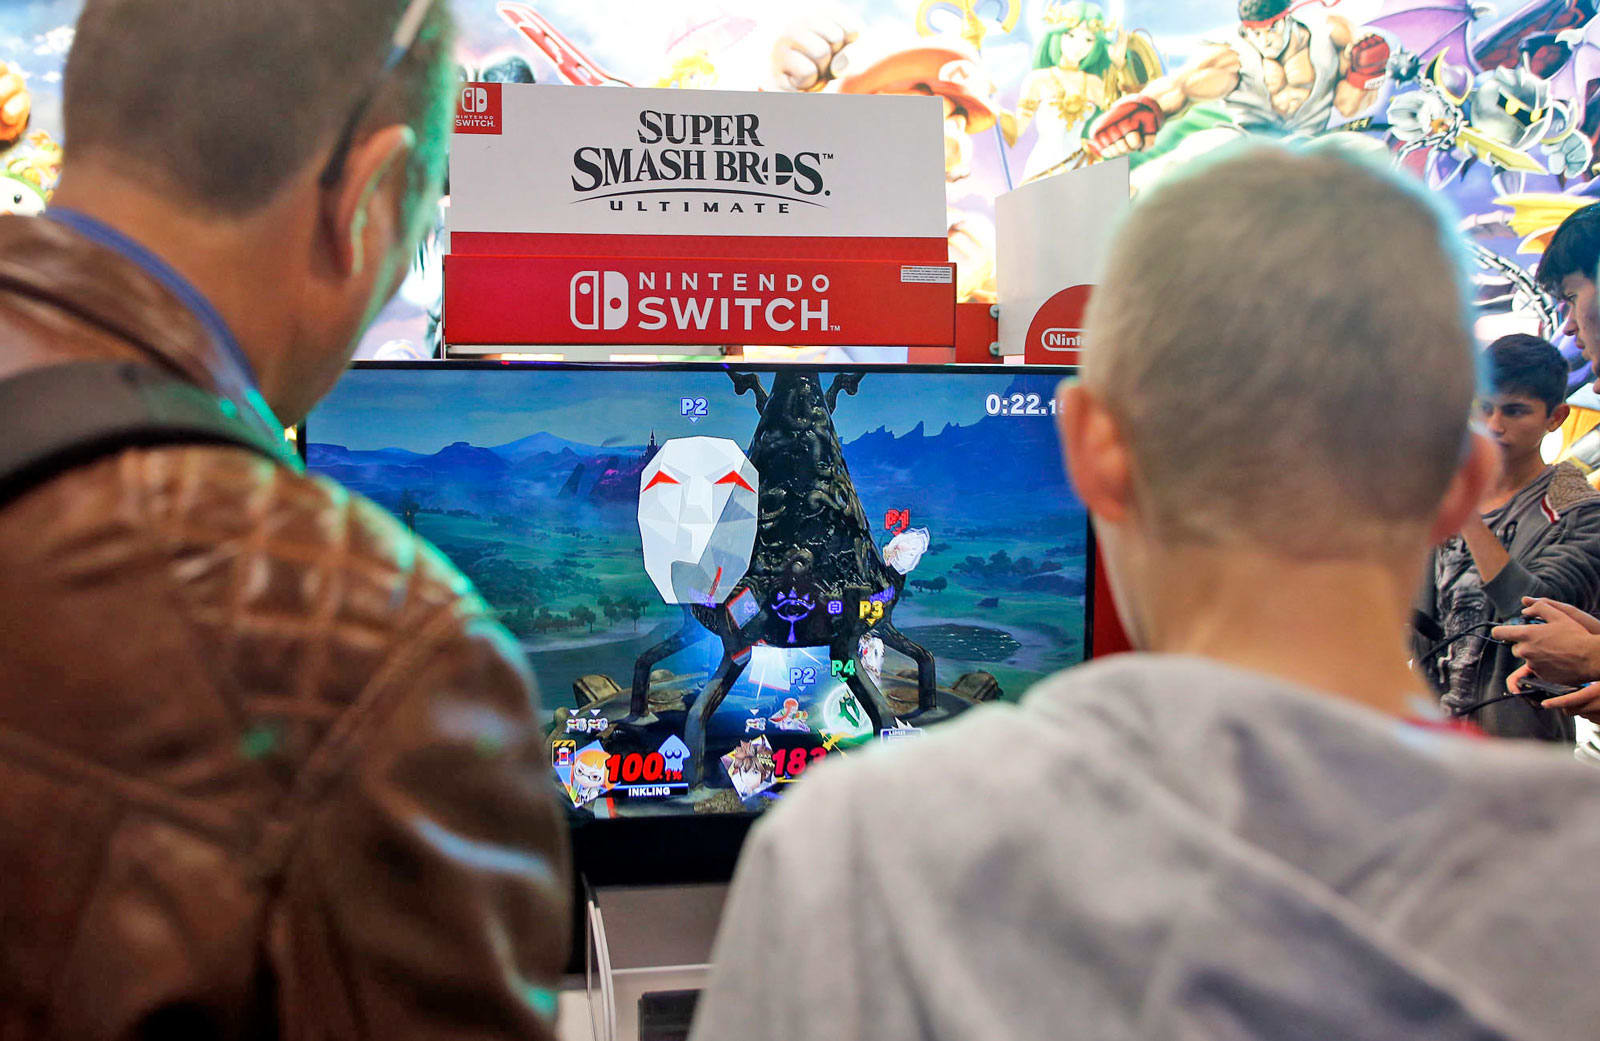 Nintendo has a piracy problem with 'Super Smash Bros  Ultimate'